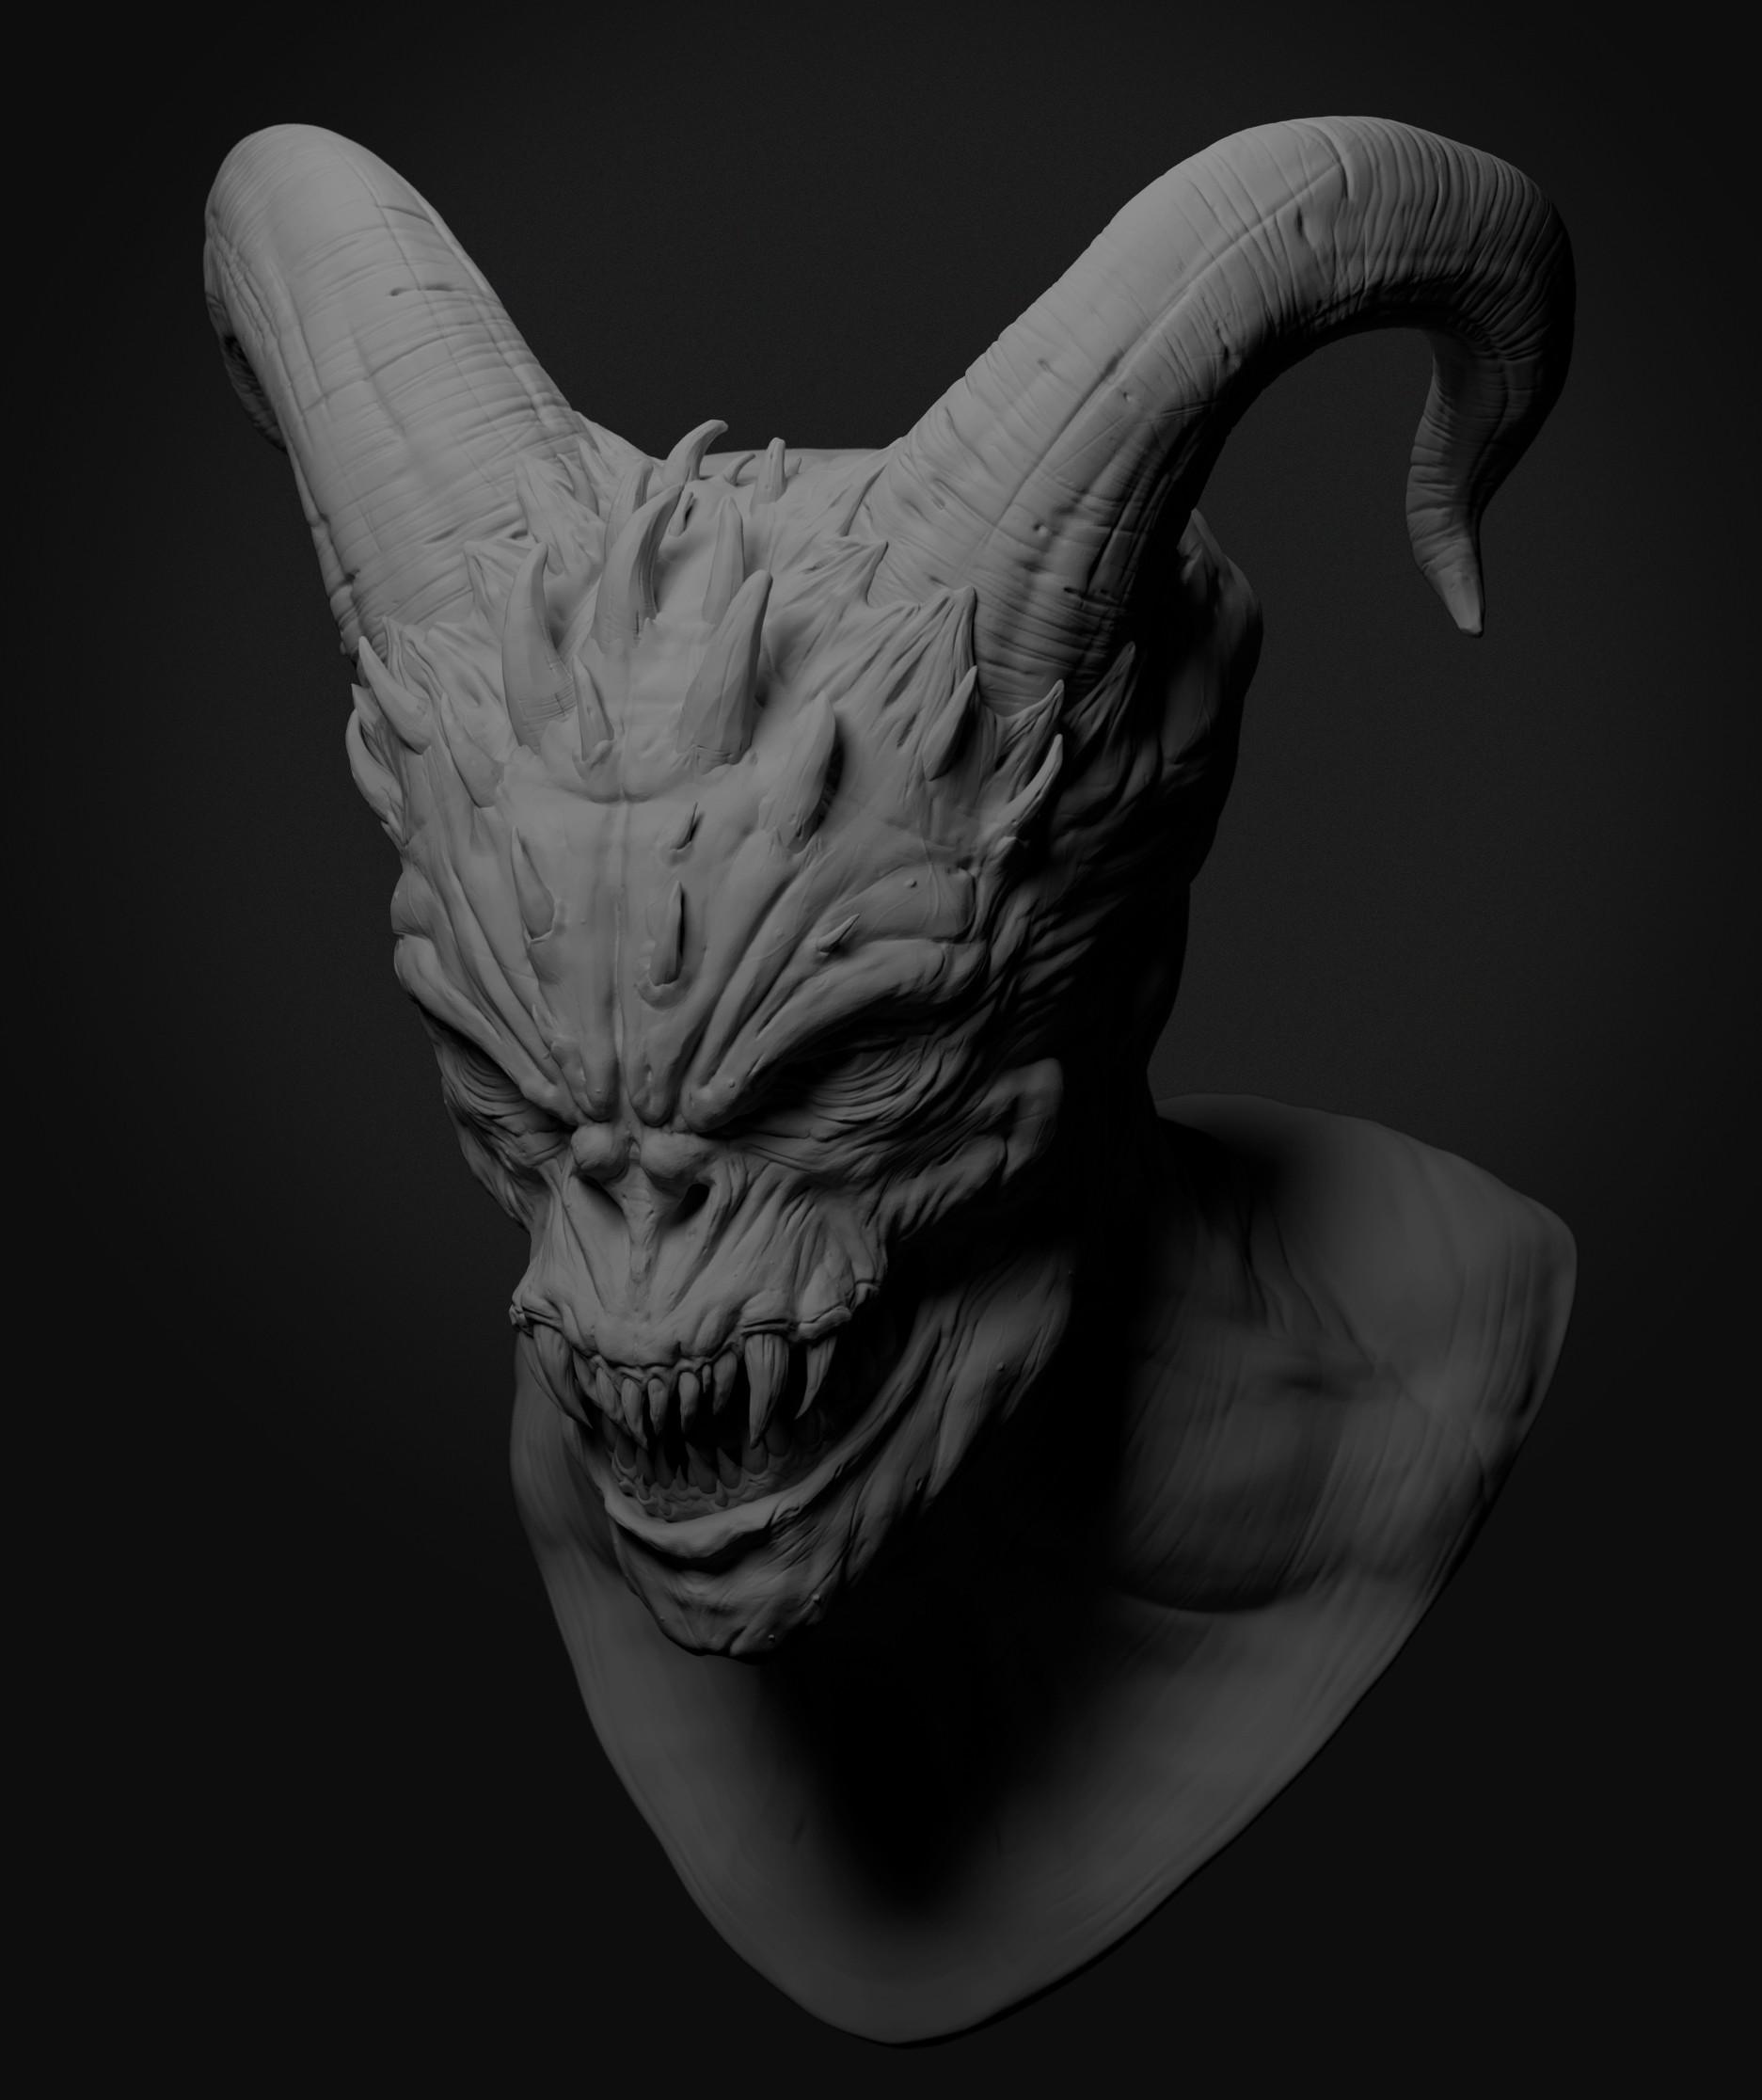 Ilhan yilmaz demon render v02 02